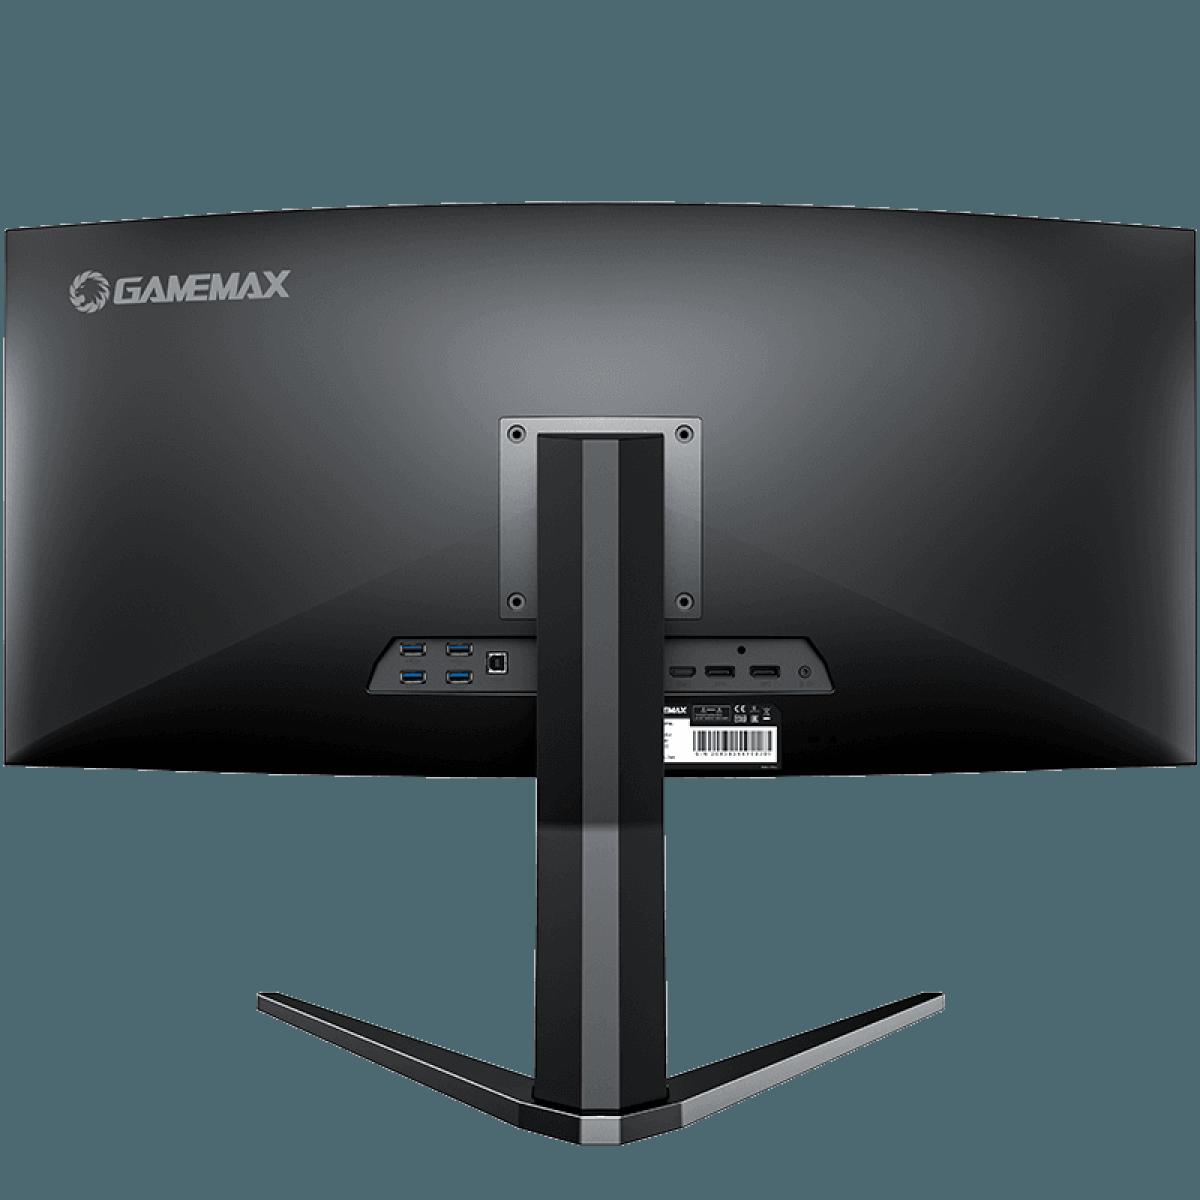 Monitor Gamer GameMax 34 Pol Ultra Wide Curvo, WQHD, 144Hz, 1ms, Black, GMX34CKXQ